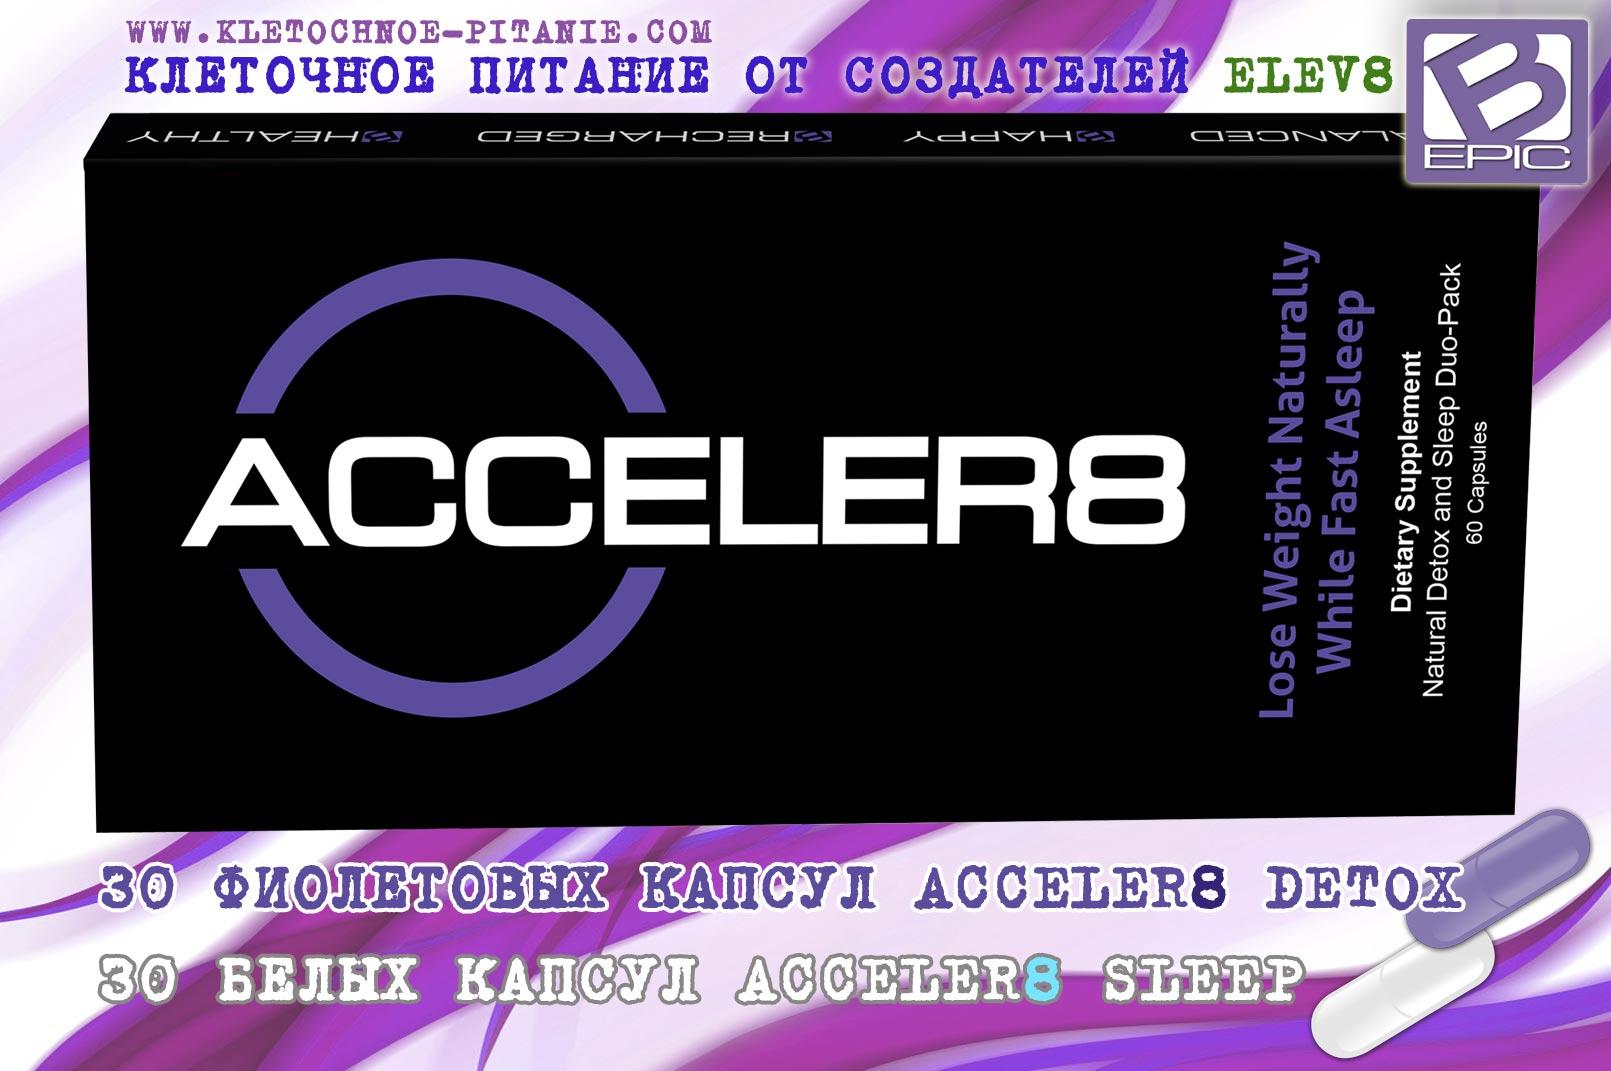 Acceler8 капсулы